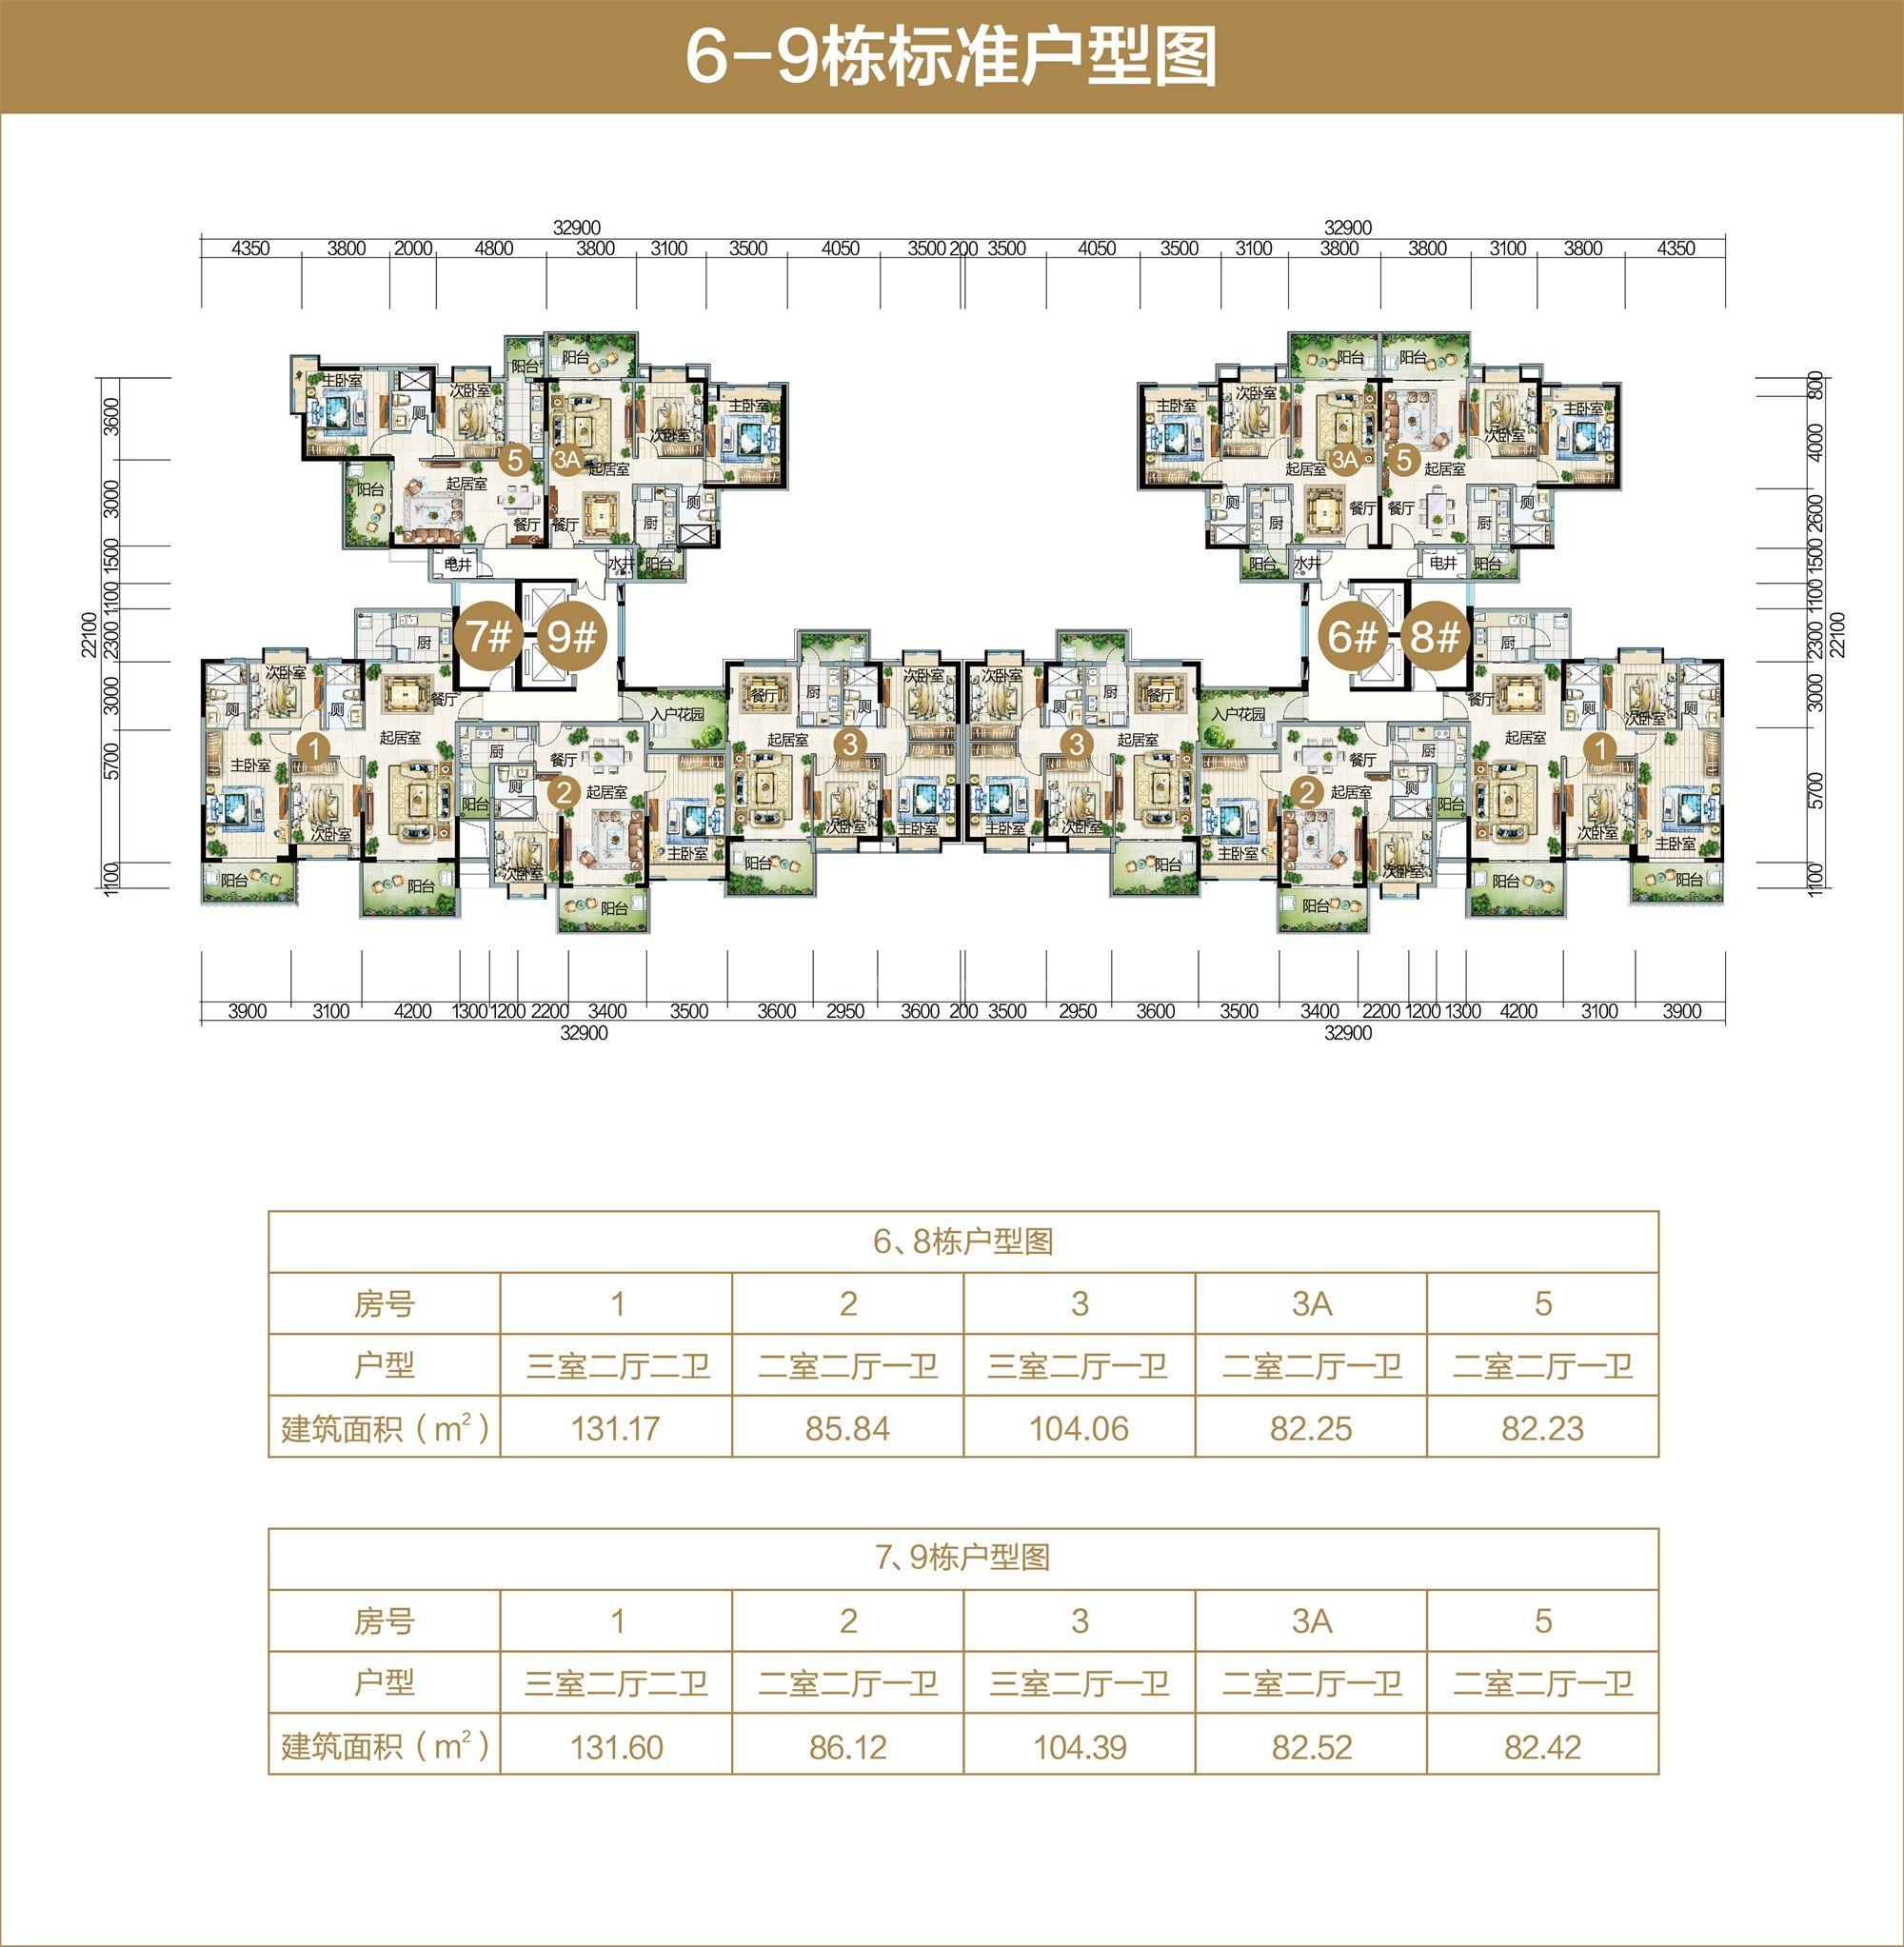 D04-1区6-9栋标准户型图